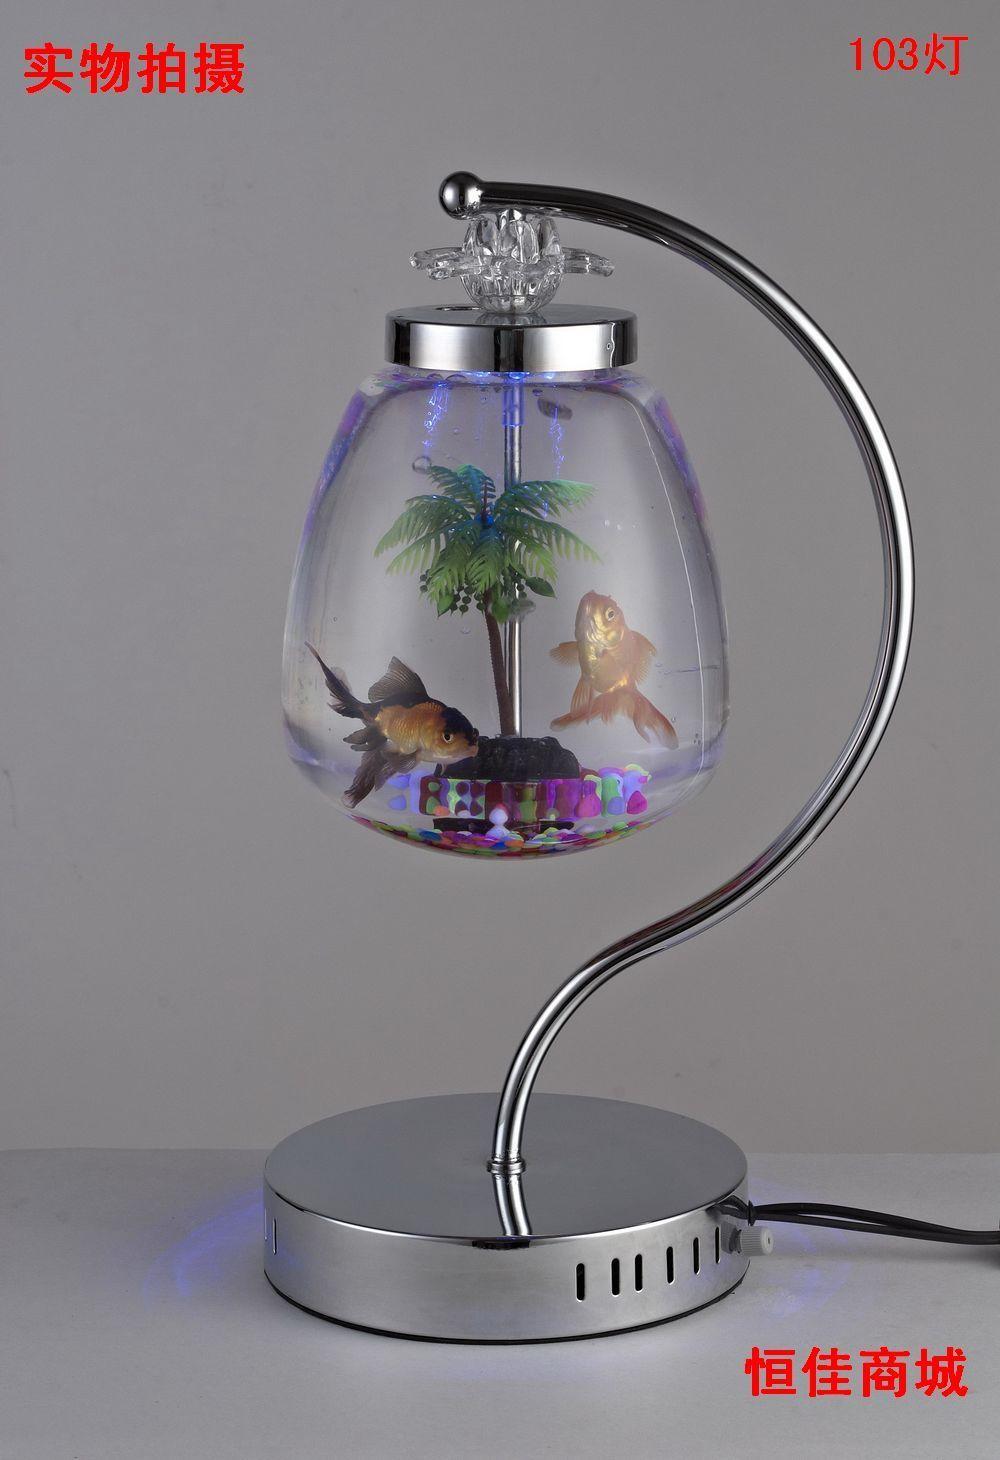 Table-lamp-fish-tank-small-desktop-fish-tank-goldfish-bowl ...